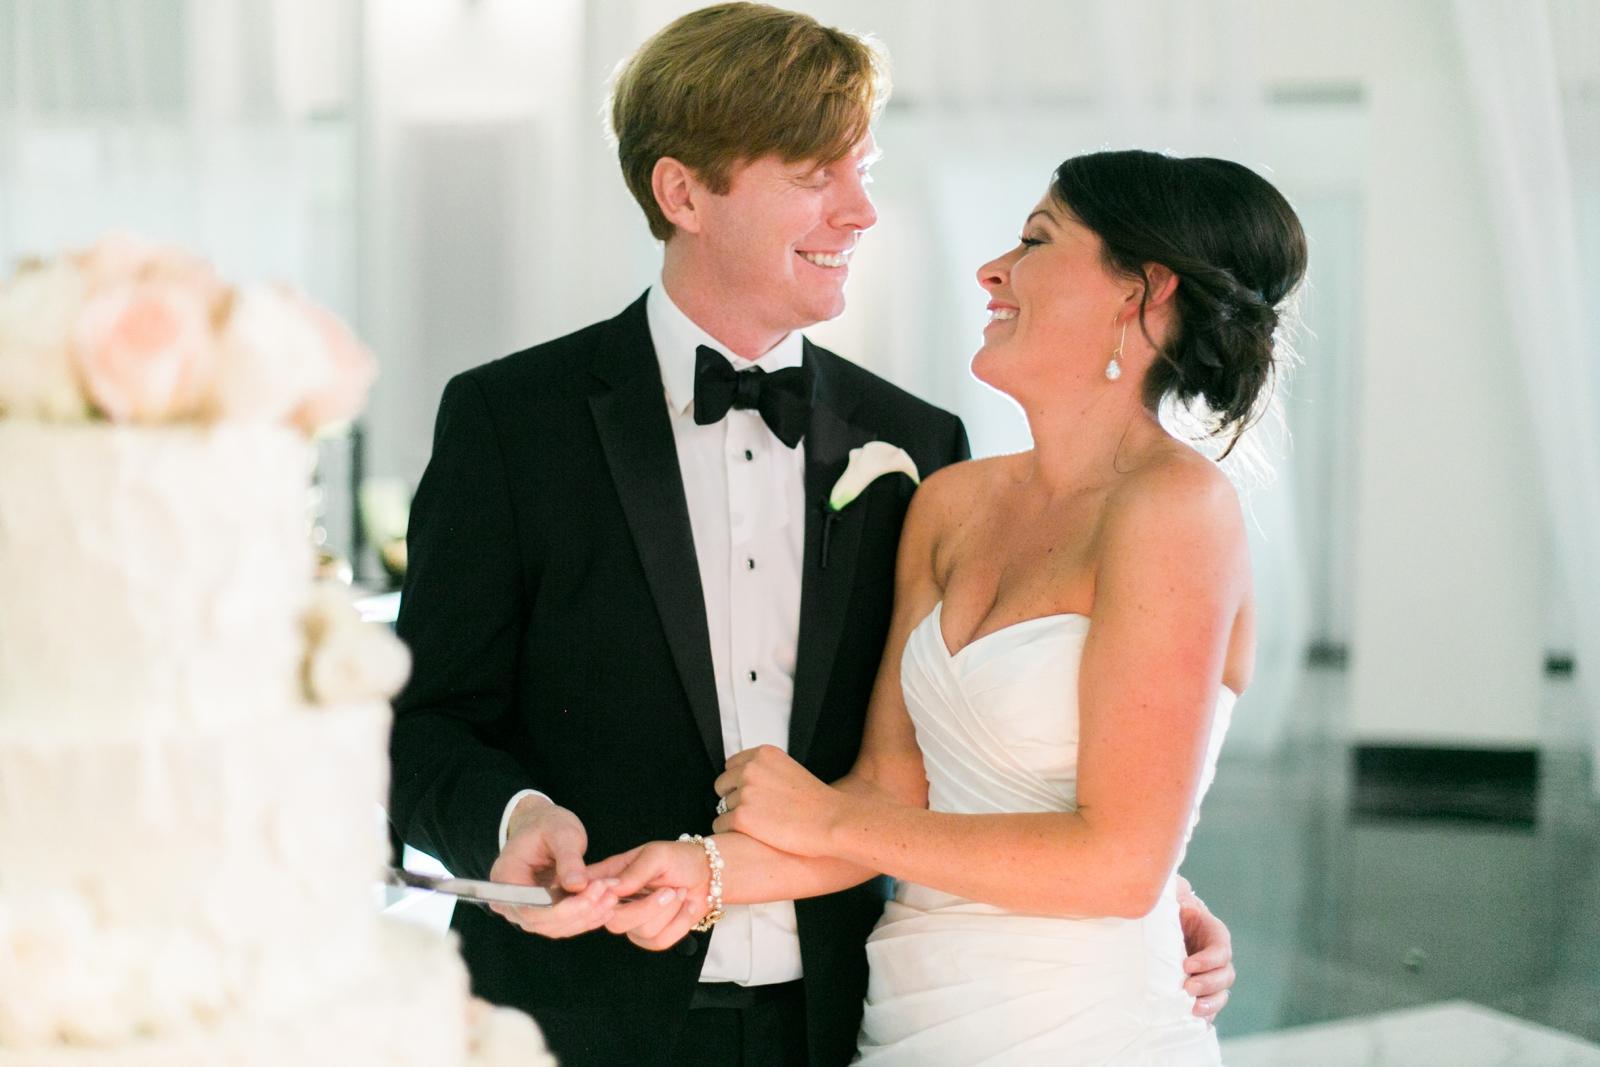 atrium at curtis center wedding photographer philadelphia wedding photographer shannon griffin_0042.jpg